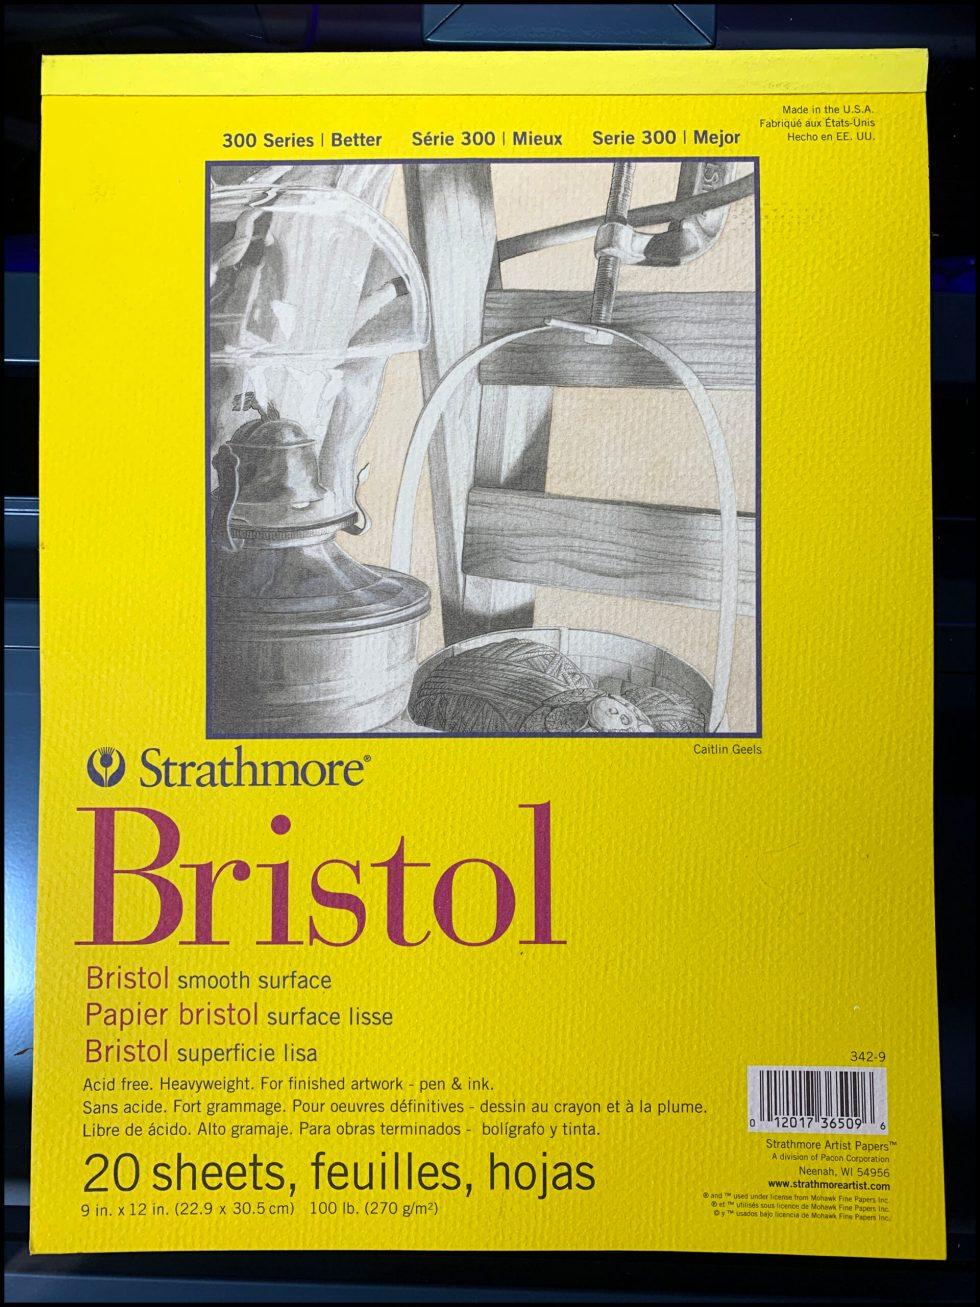 Strathmore Bristol 300 Series Paper